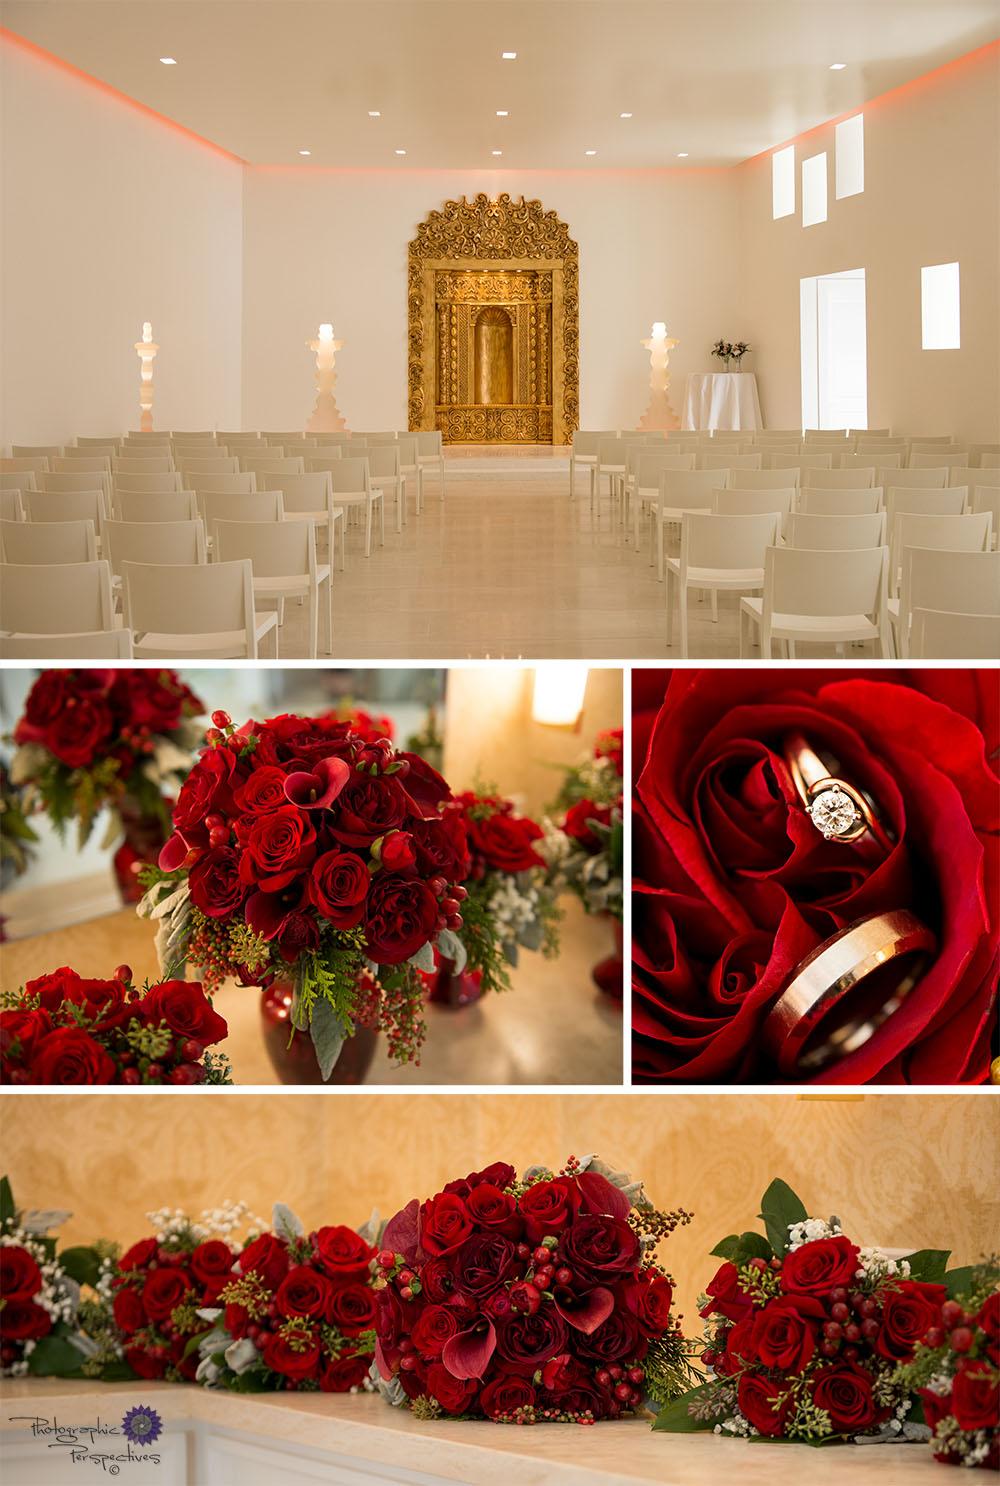 Red Rose wedding at the Eldorado Hotel in Santa Fe, New Mexico.